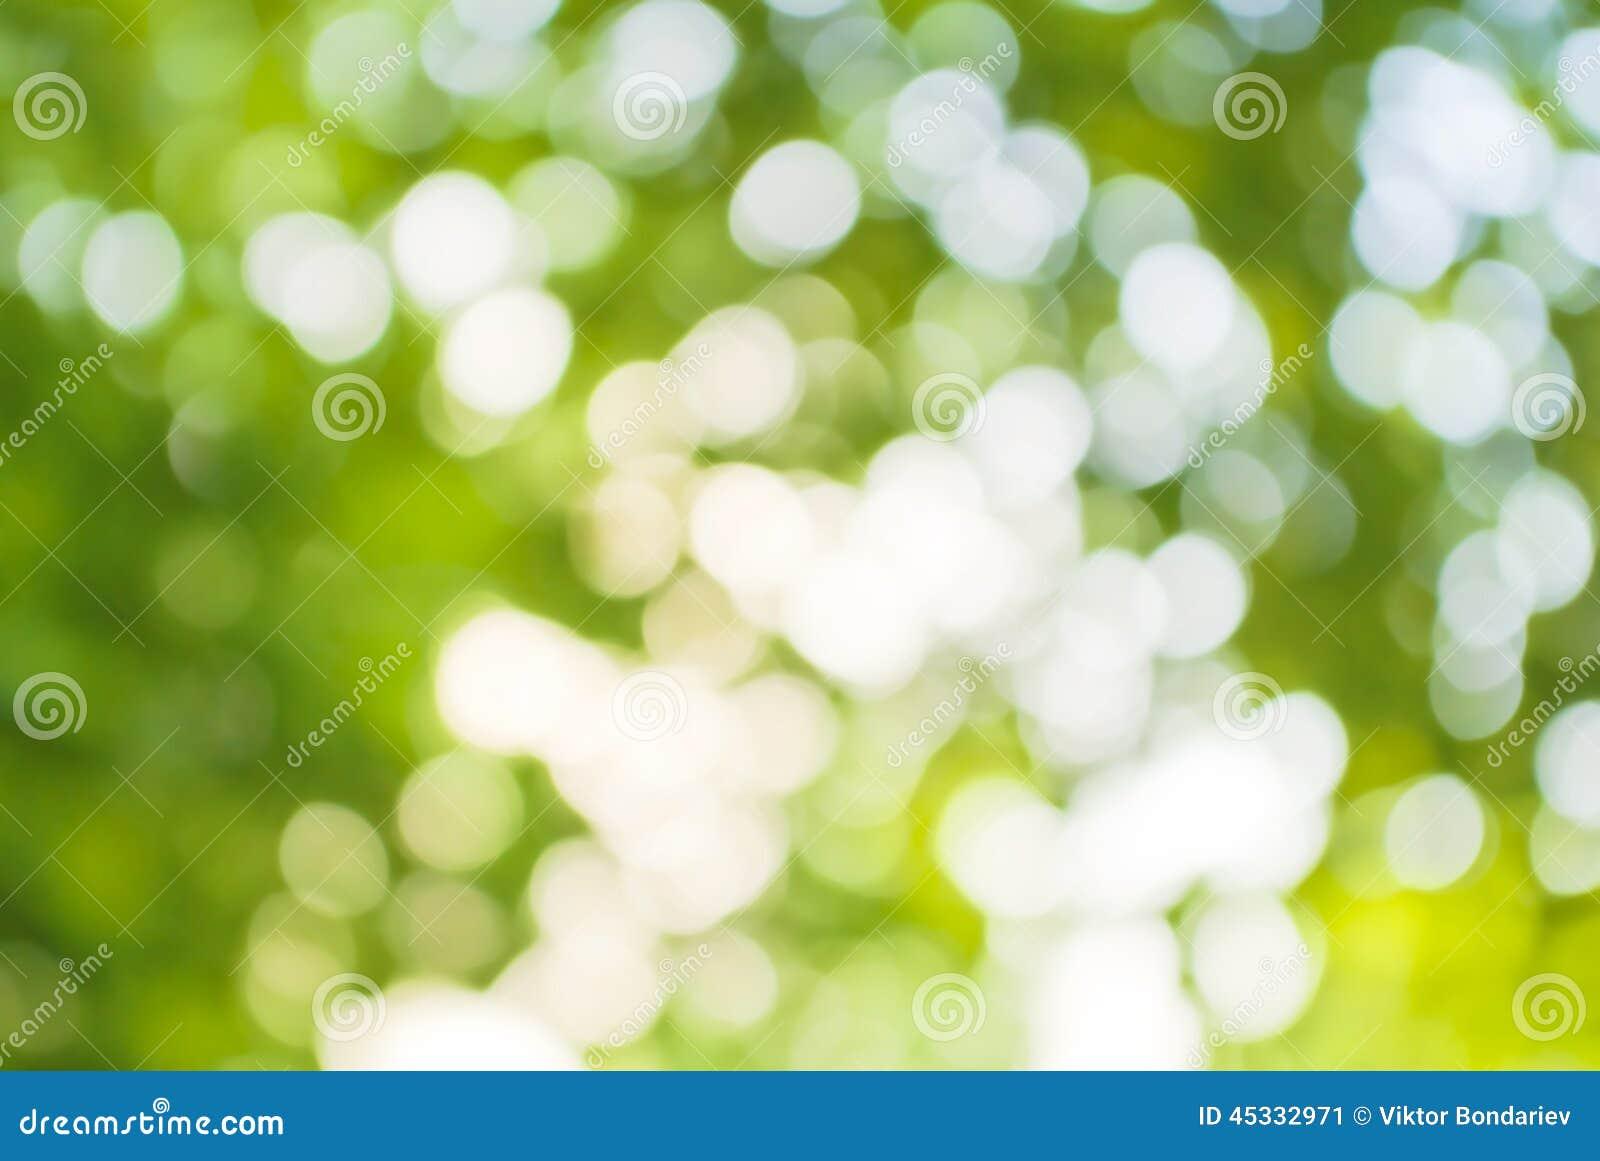 Abstracte achtergrond van groene groente